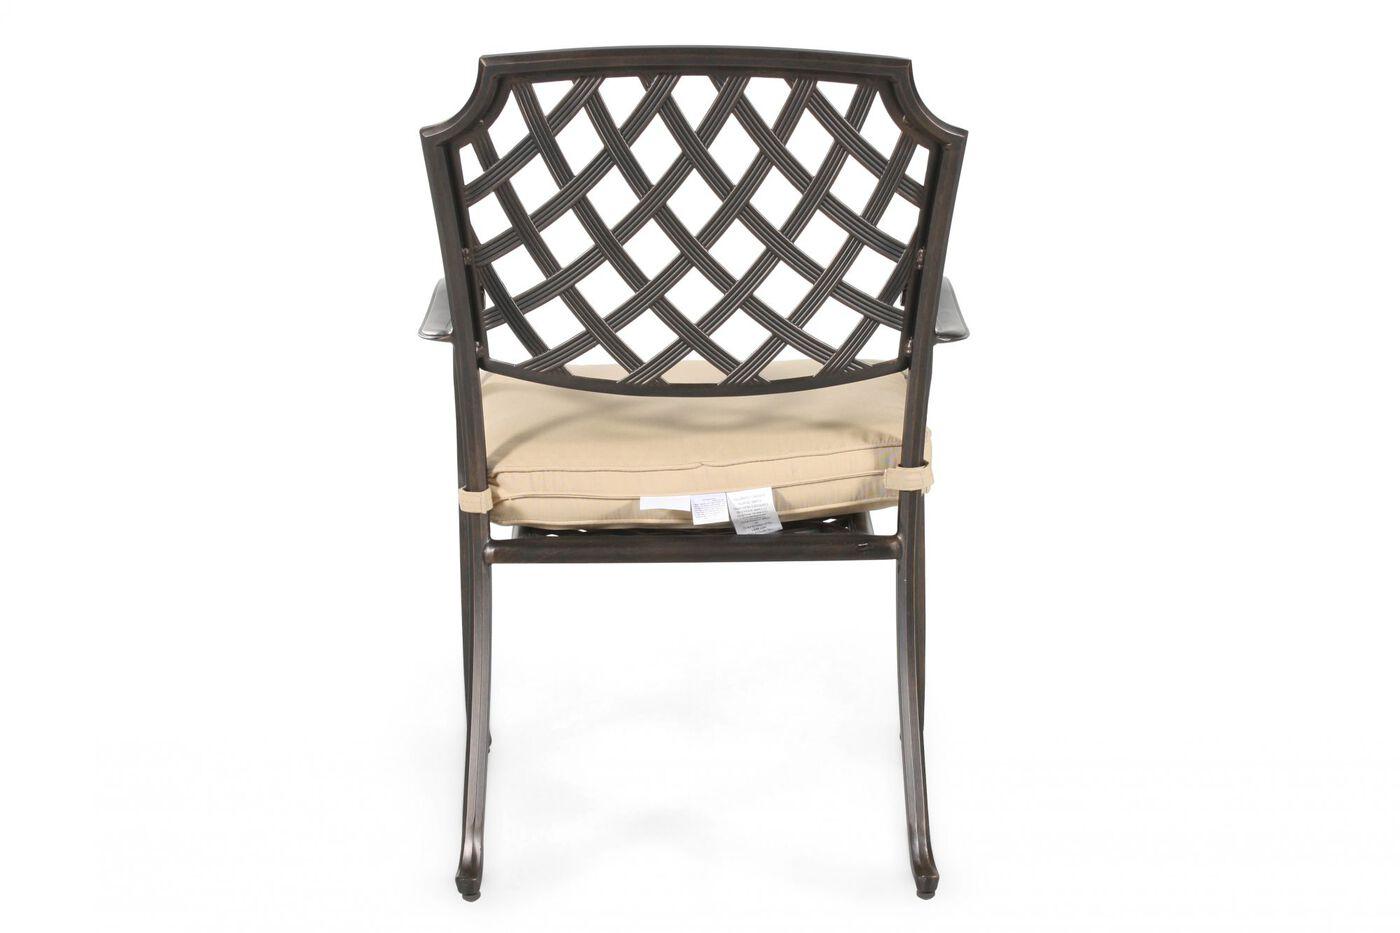 Mathis Brothers Patio Furniture agio heritage select patio dining chair | mathis brothers furniture